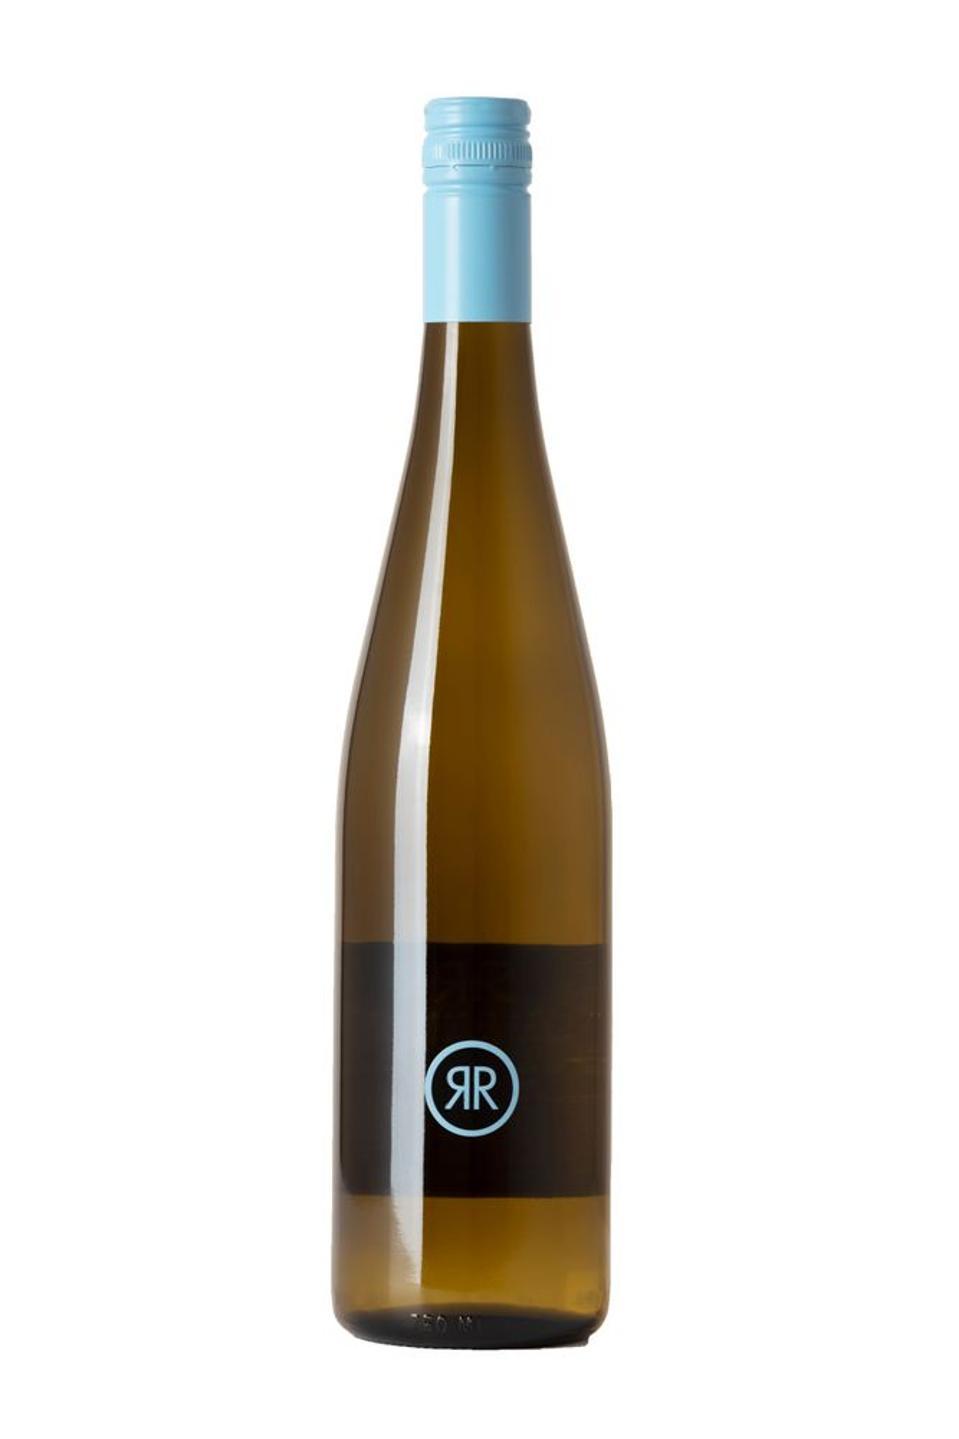 Ridgecrest 2018 Vineyards RR Riesling